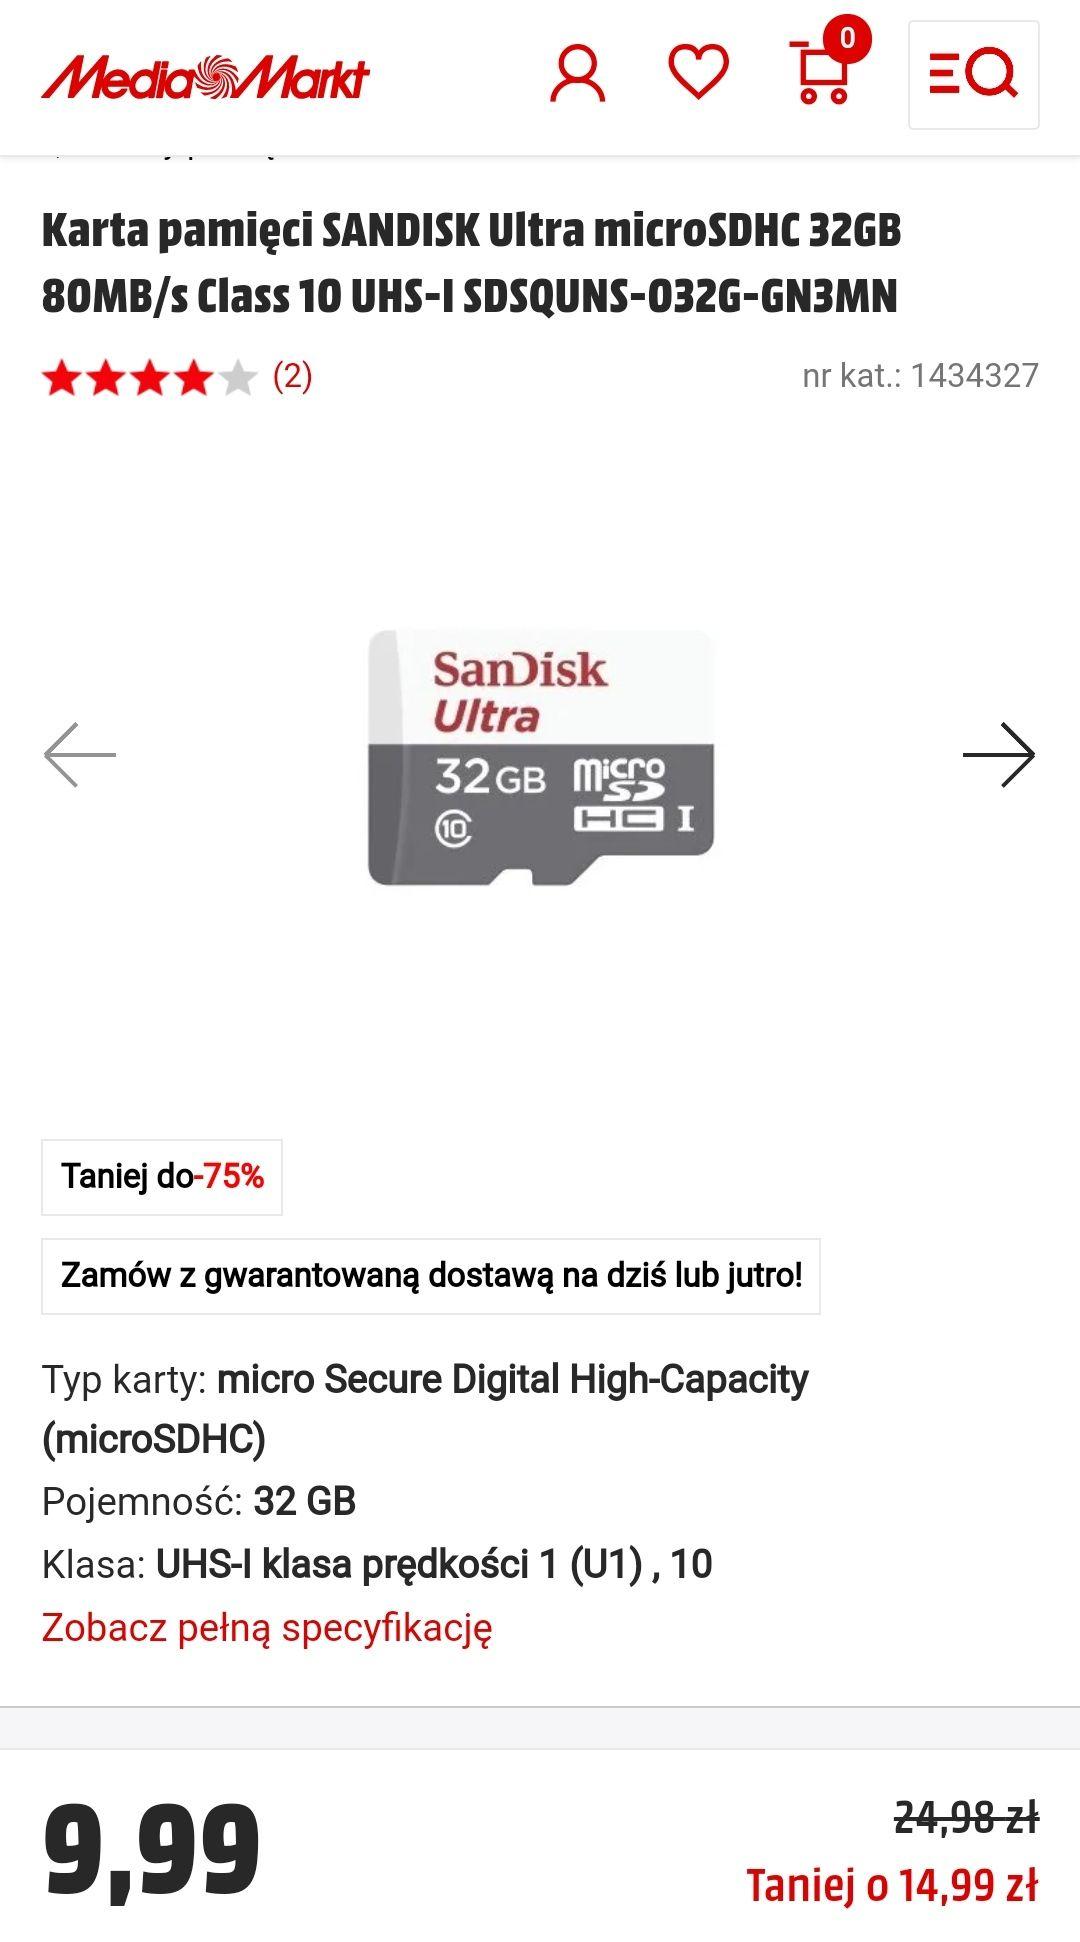 Karta pamięci SANDISK Ultra microSDHC 32GB